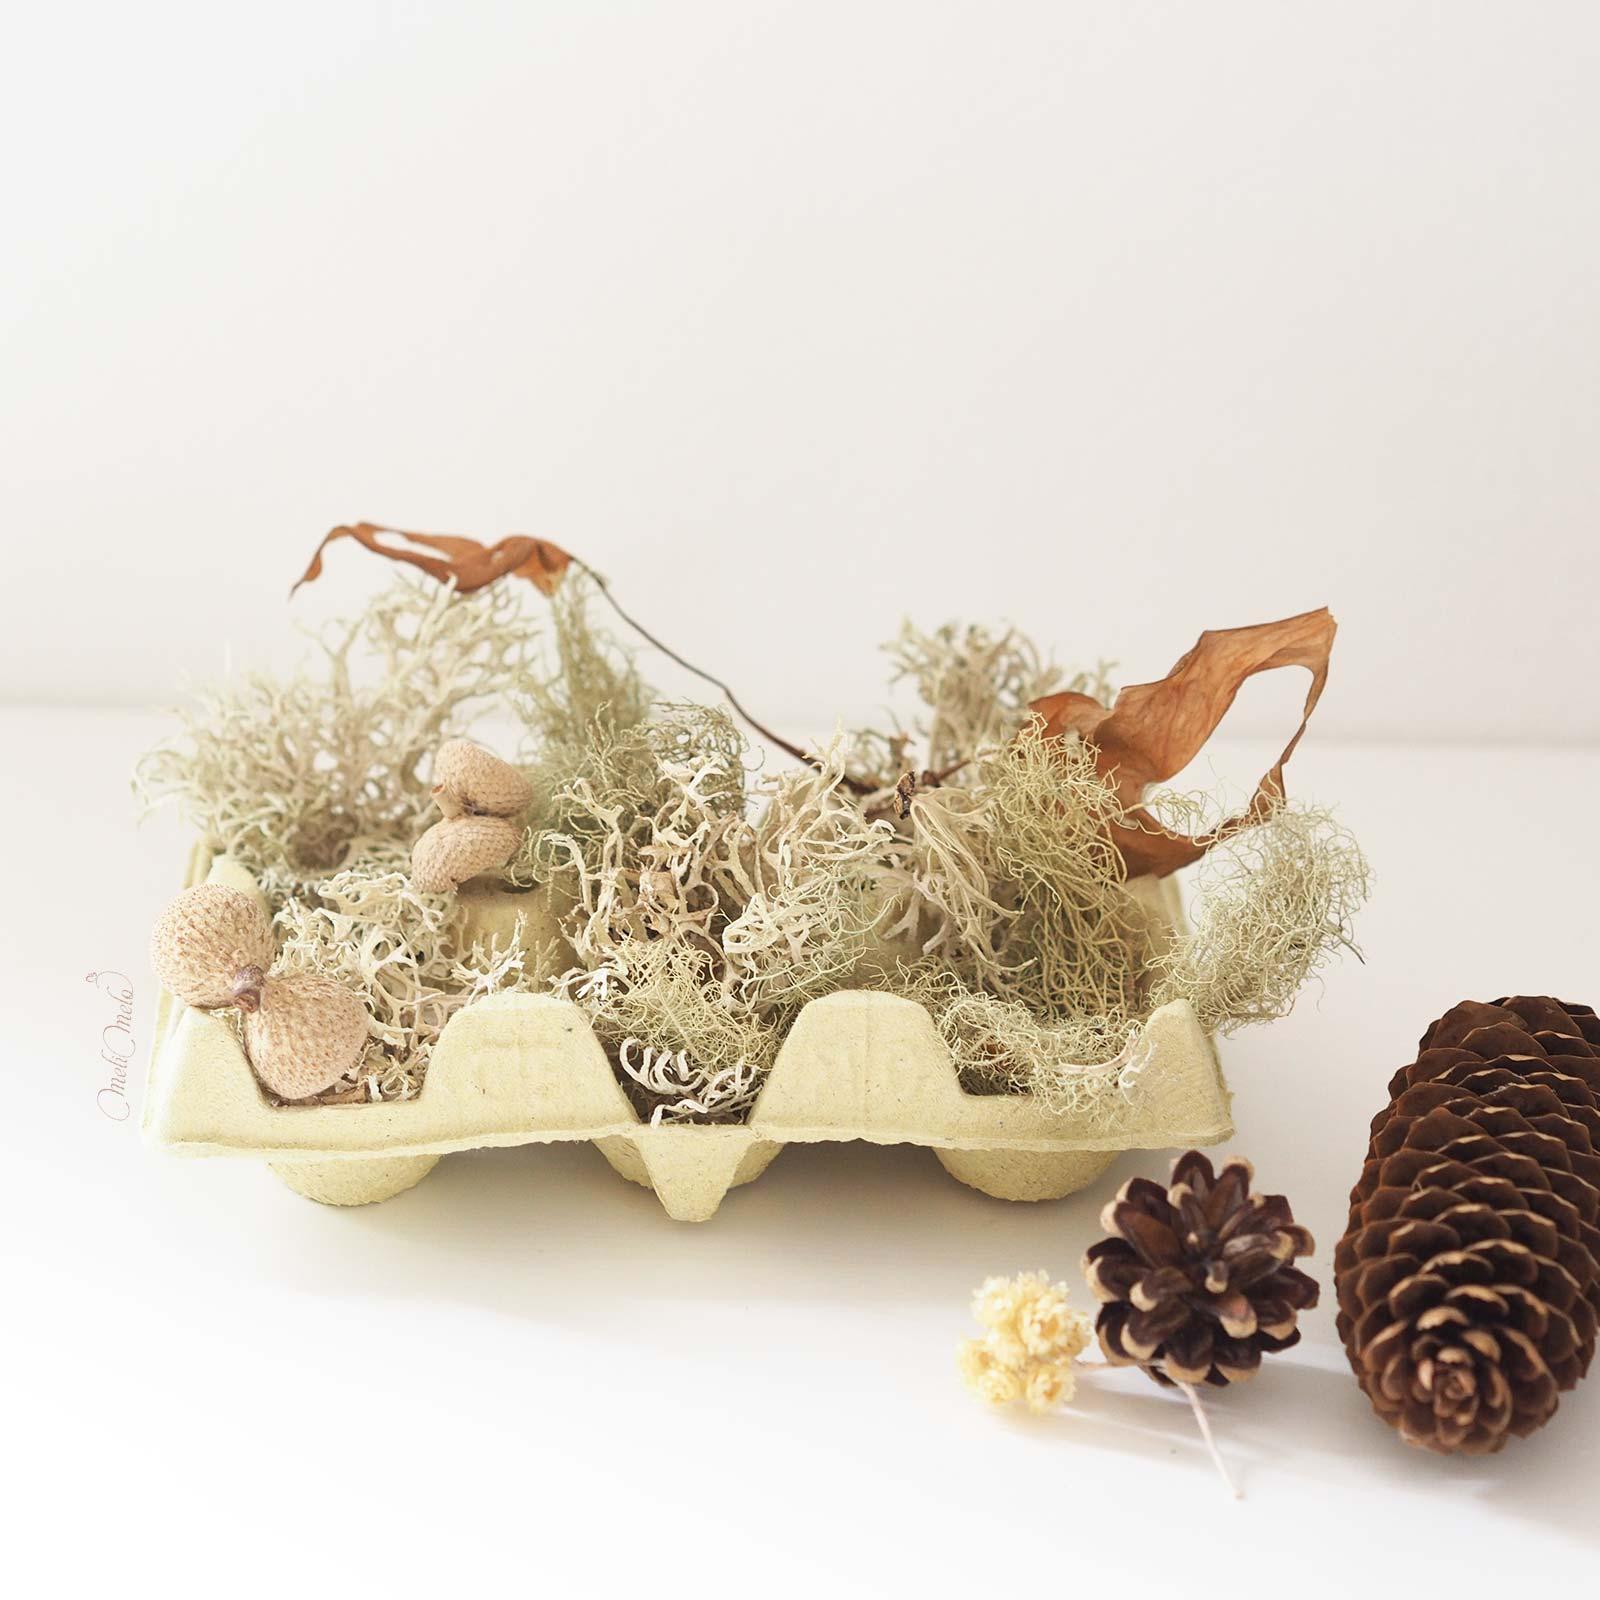 DIY-deco-automne-lichen-glands-boite-oeuf-laboutiquedemelimelo